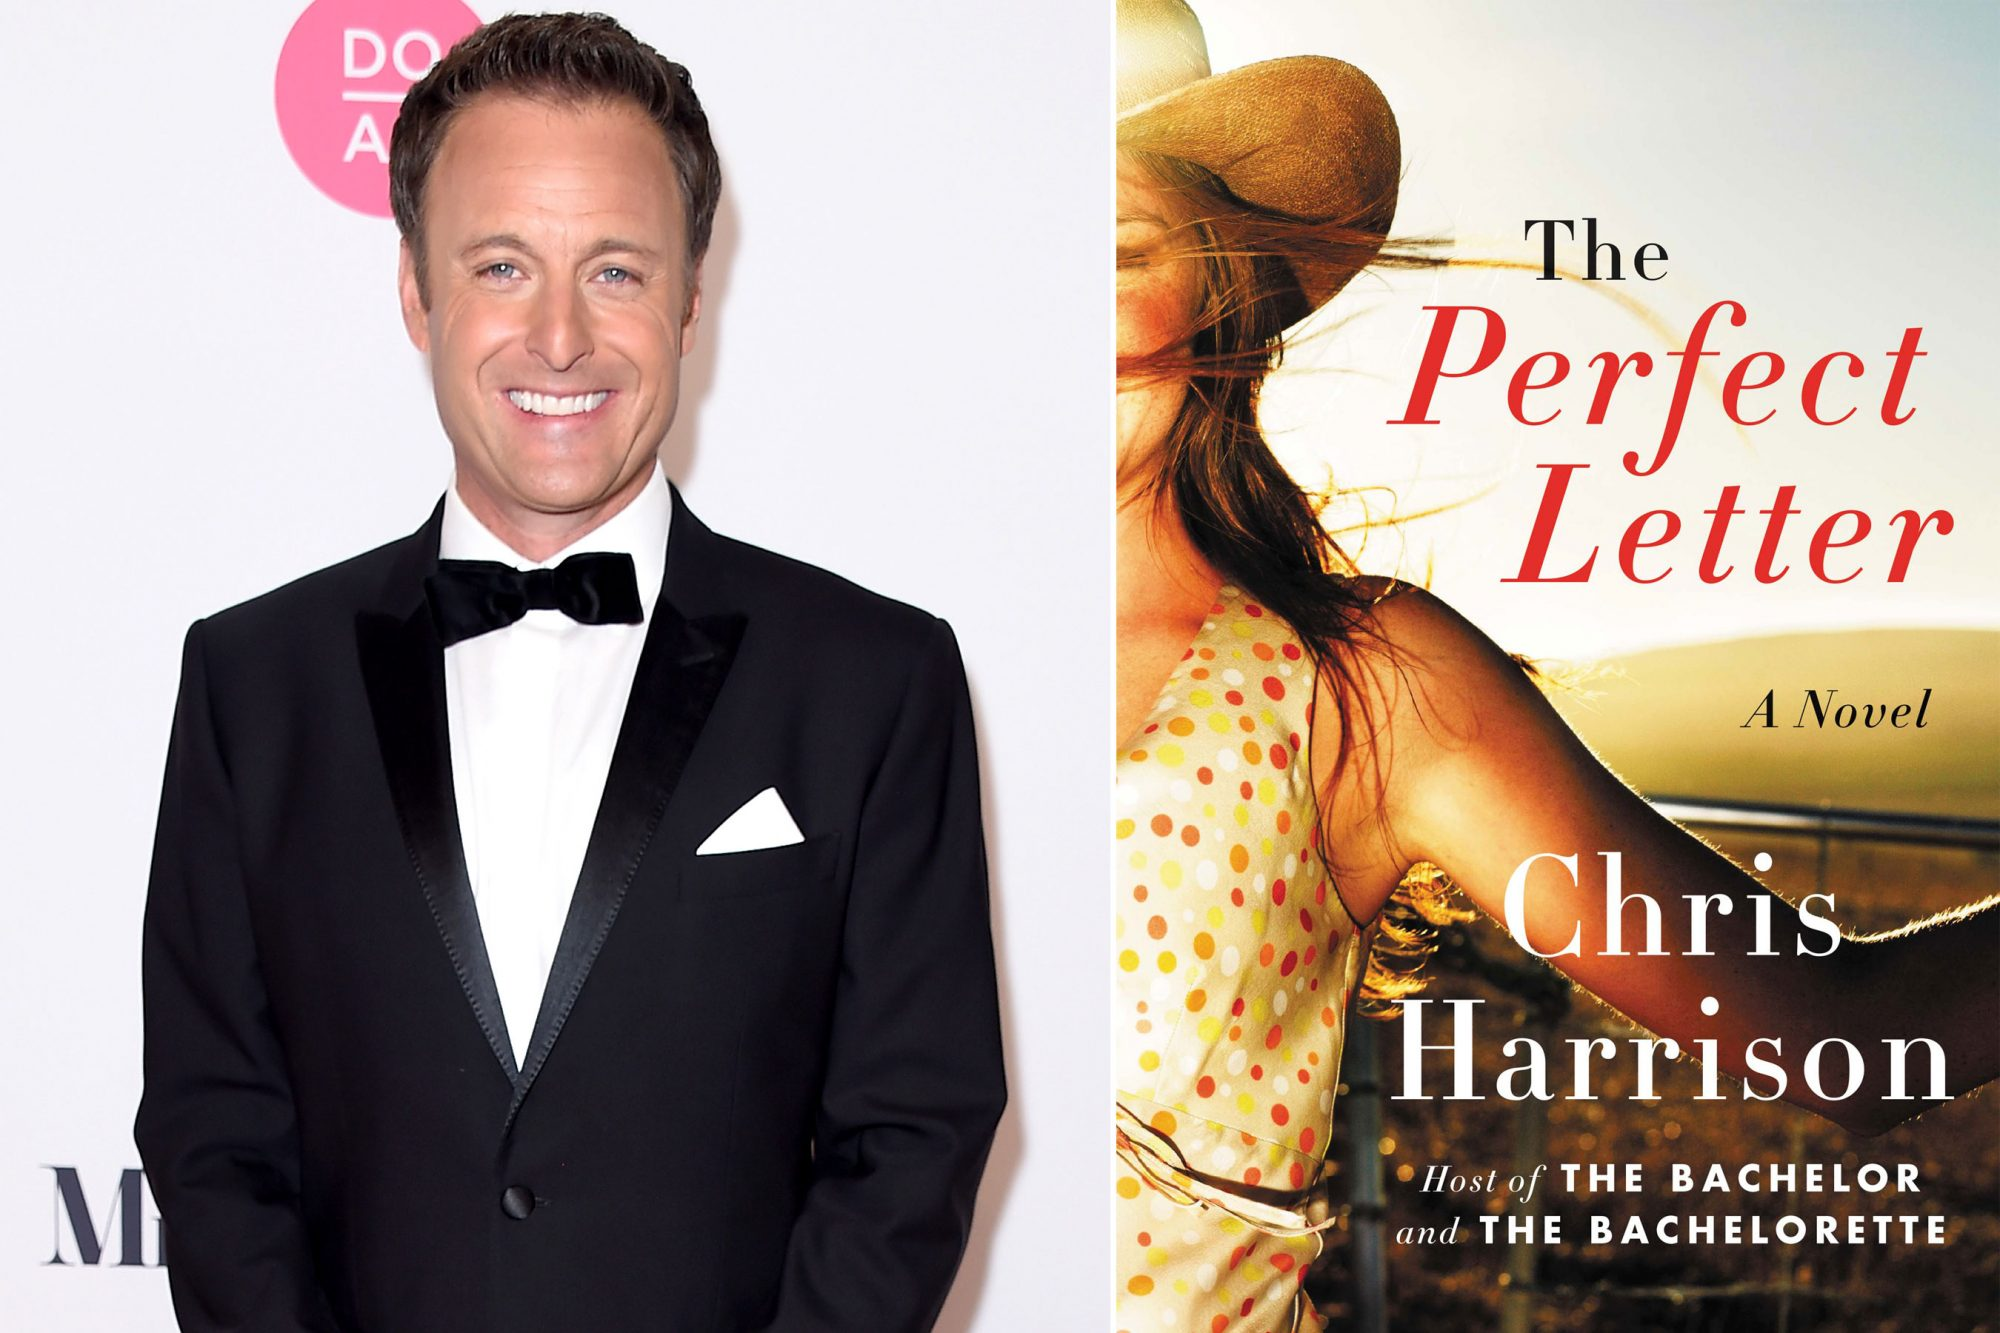 Chris-Harrison